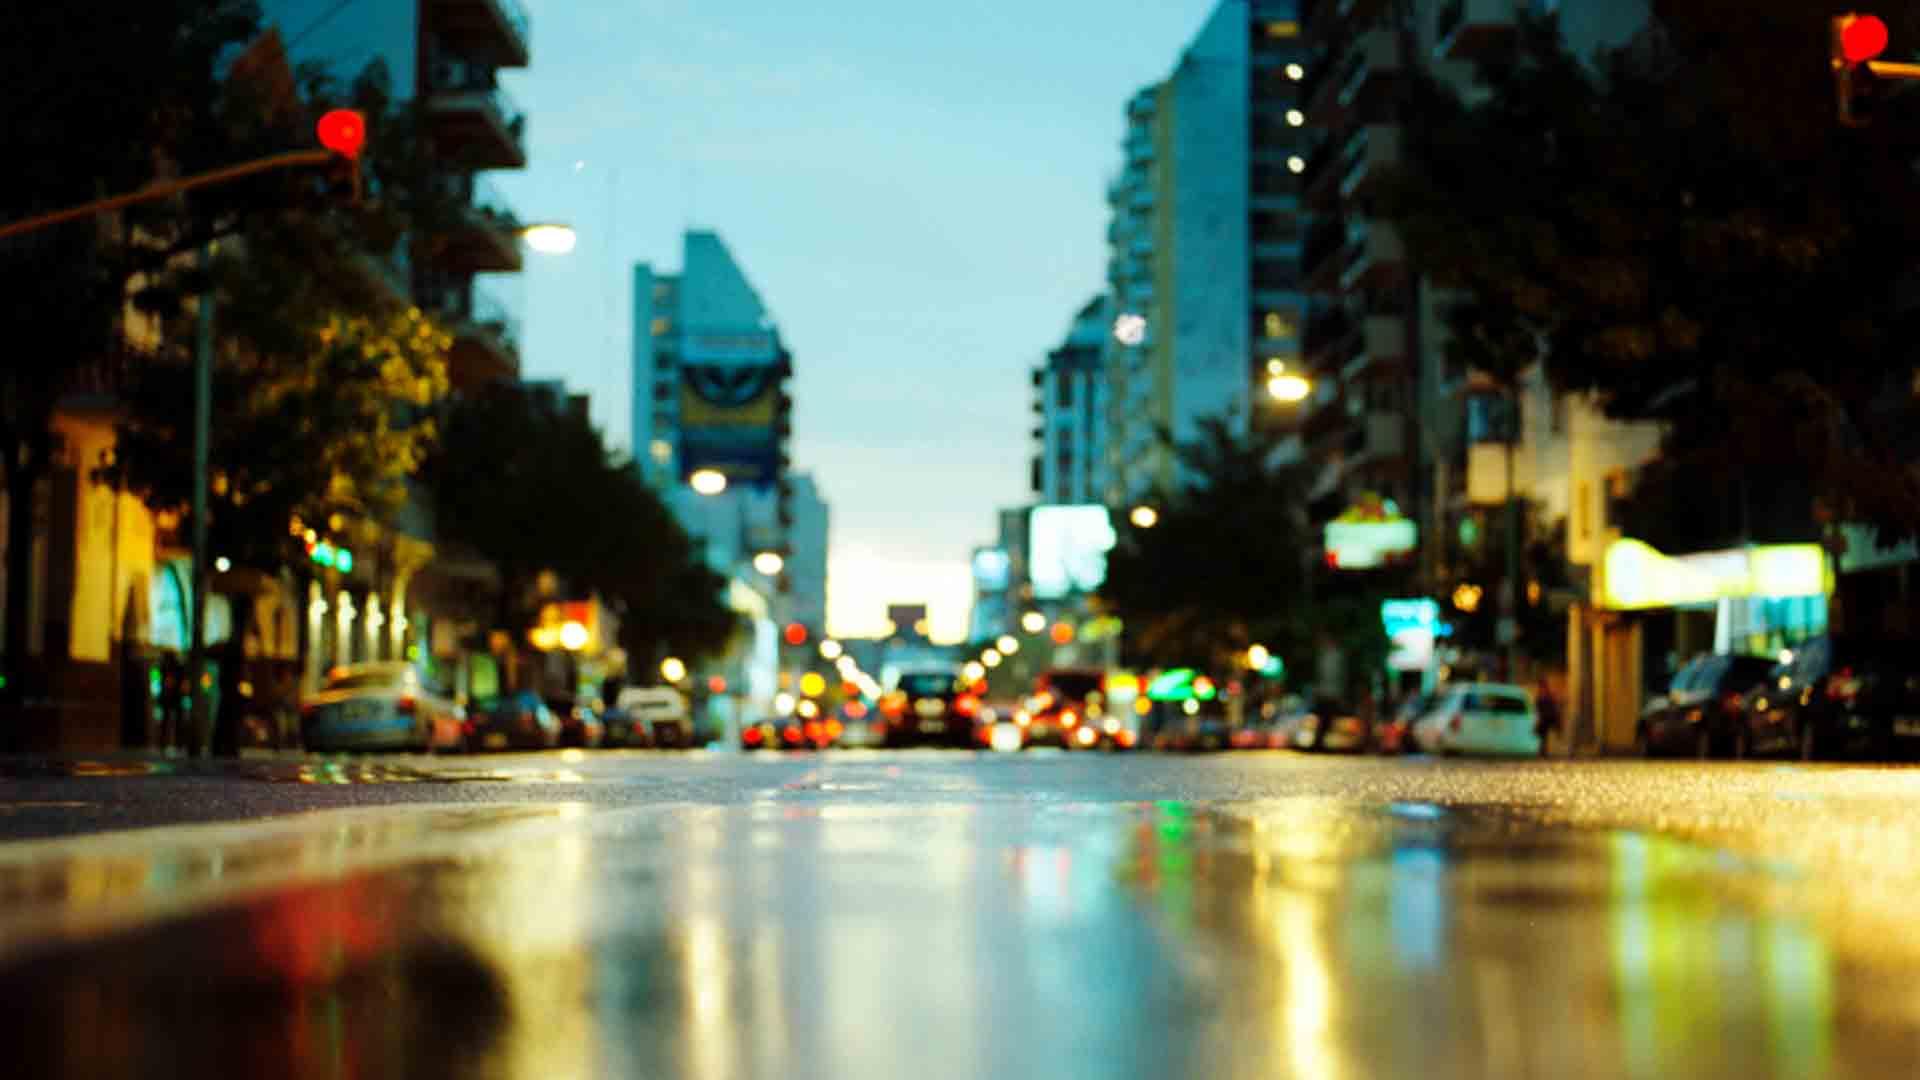 City Photography Wallpaper 1920x1080 City Photography 1920x1080